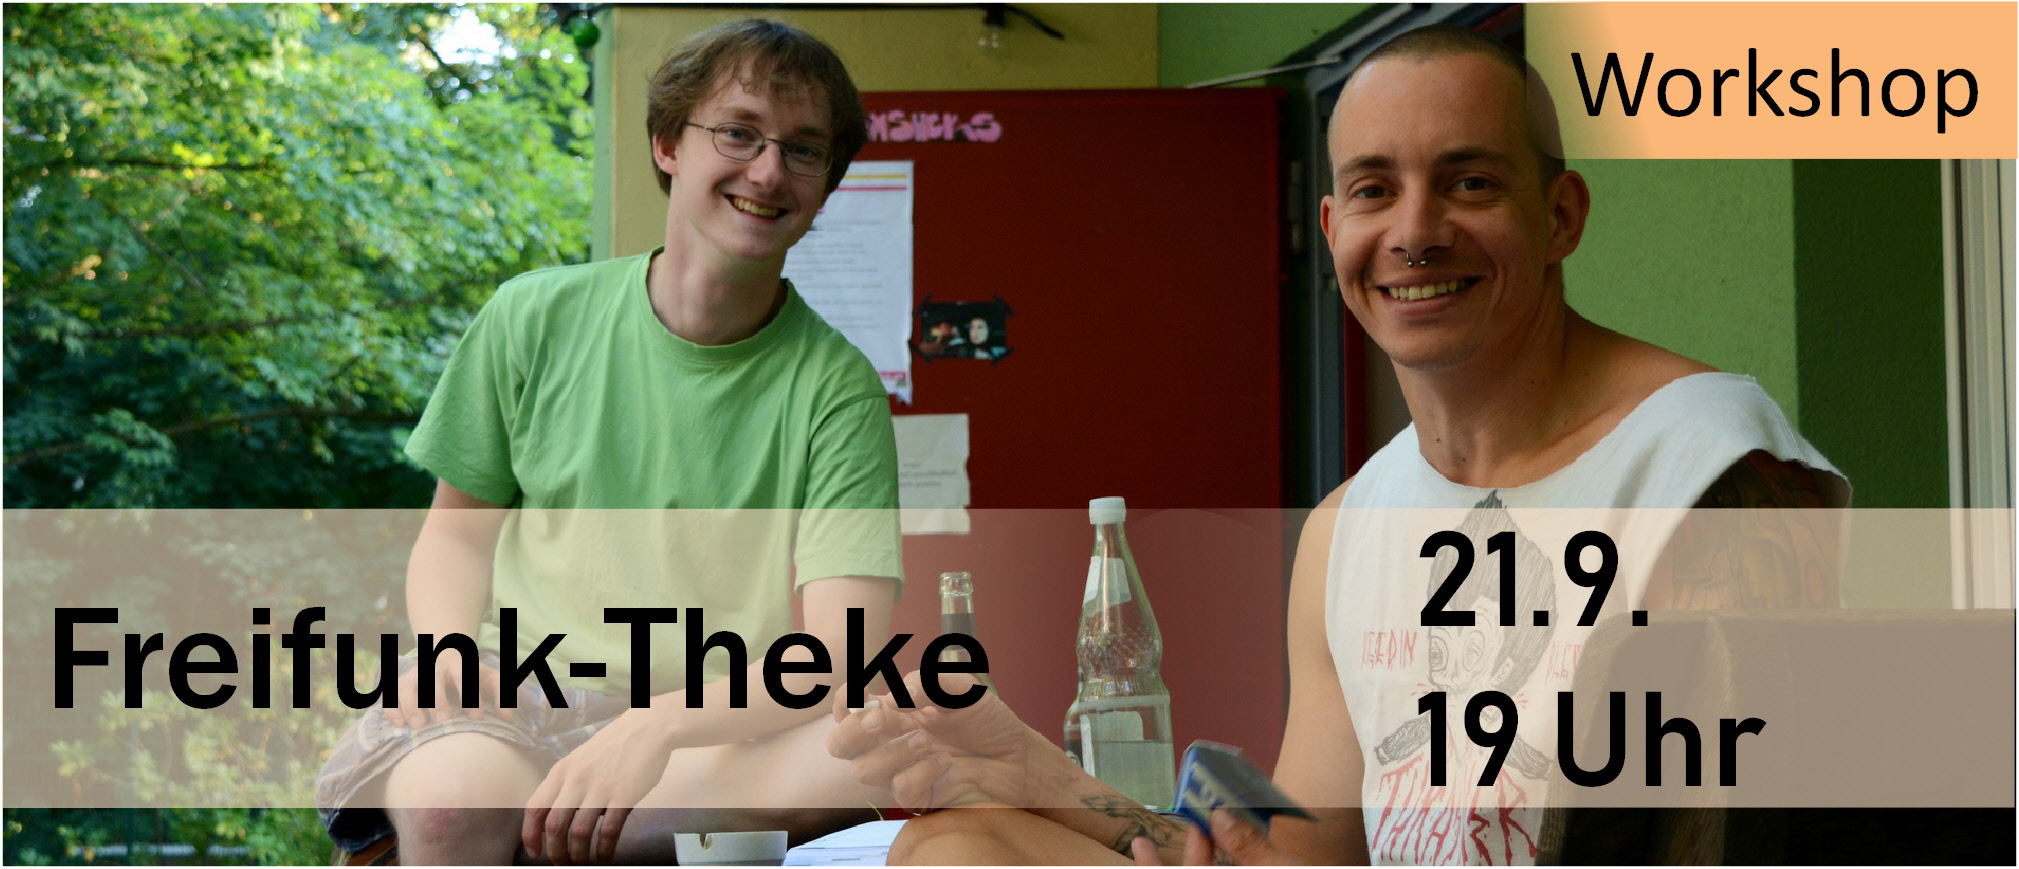 Freifunk-Theke Martin Huebner